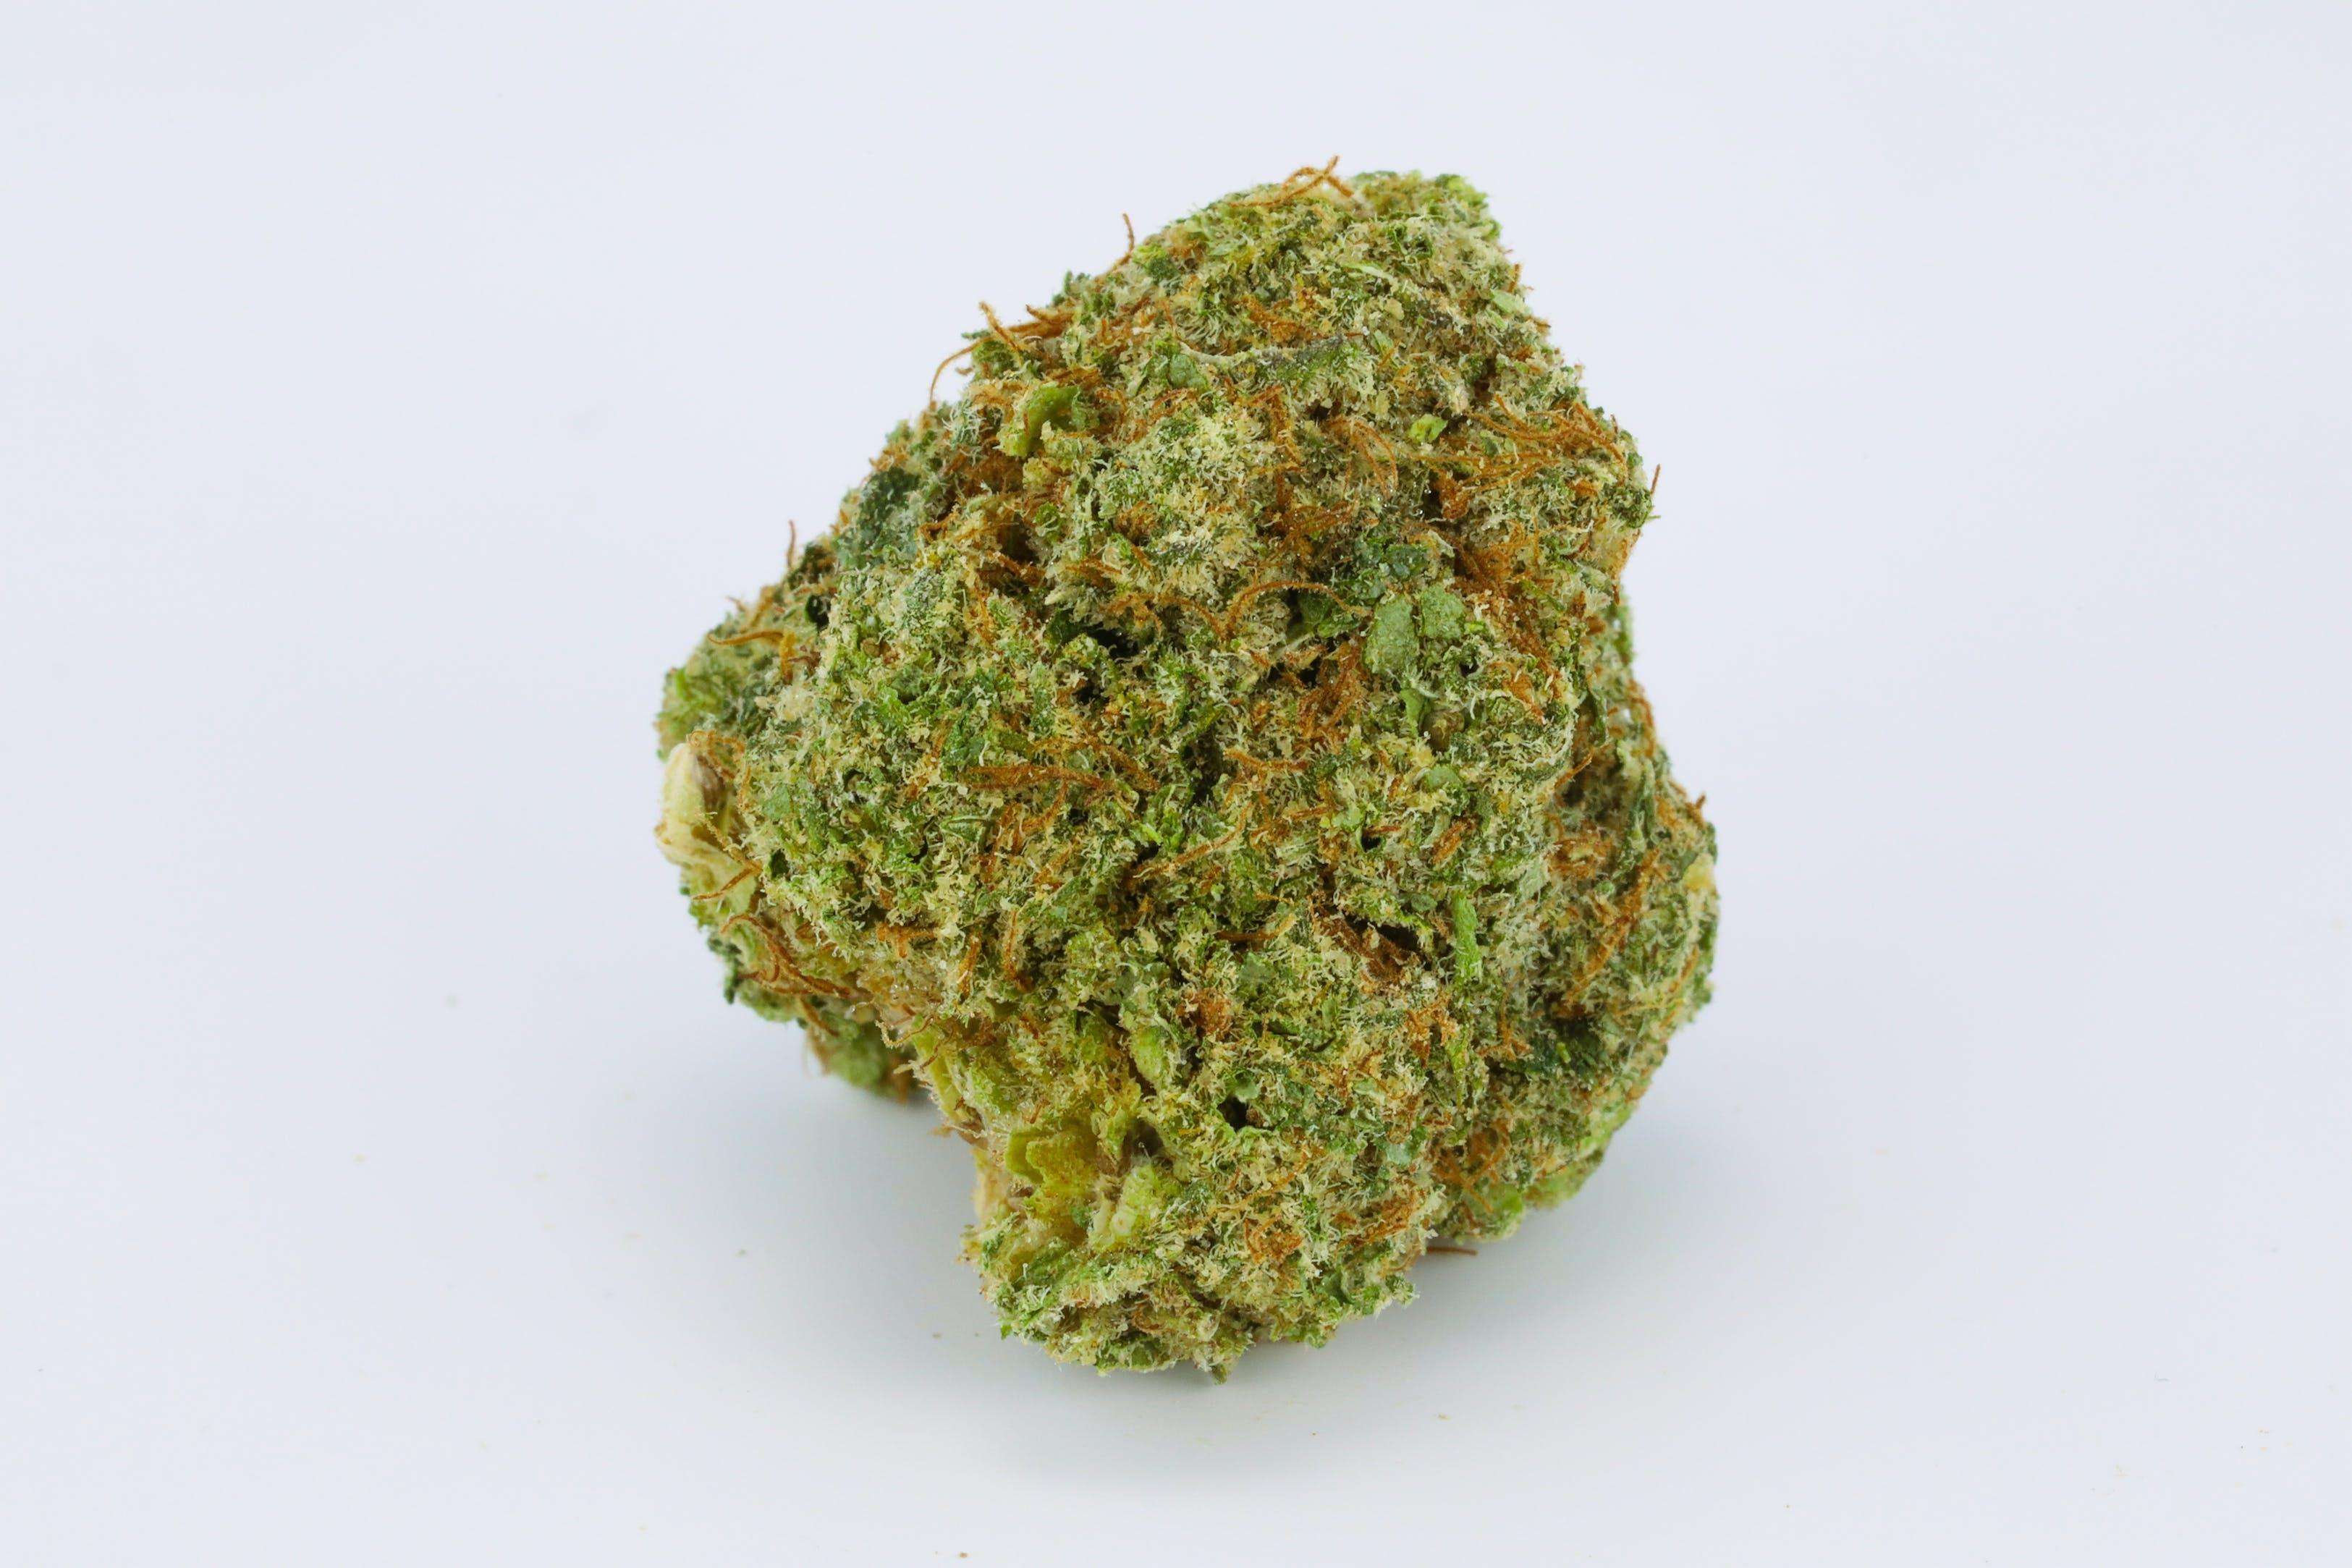 Hempstar Weed; Hempstar Cannabis Strain; Hempstar Hybrid Marijuana Strain